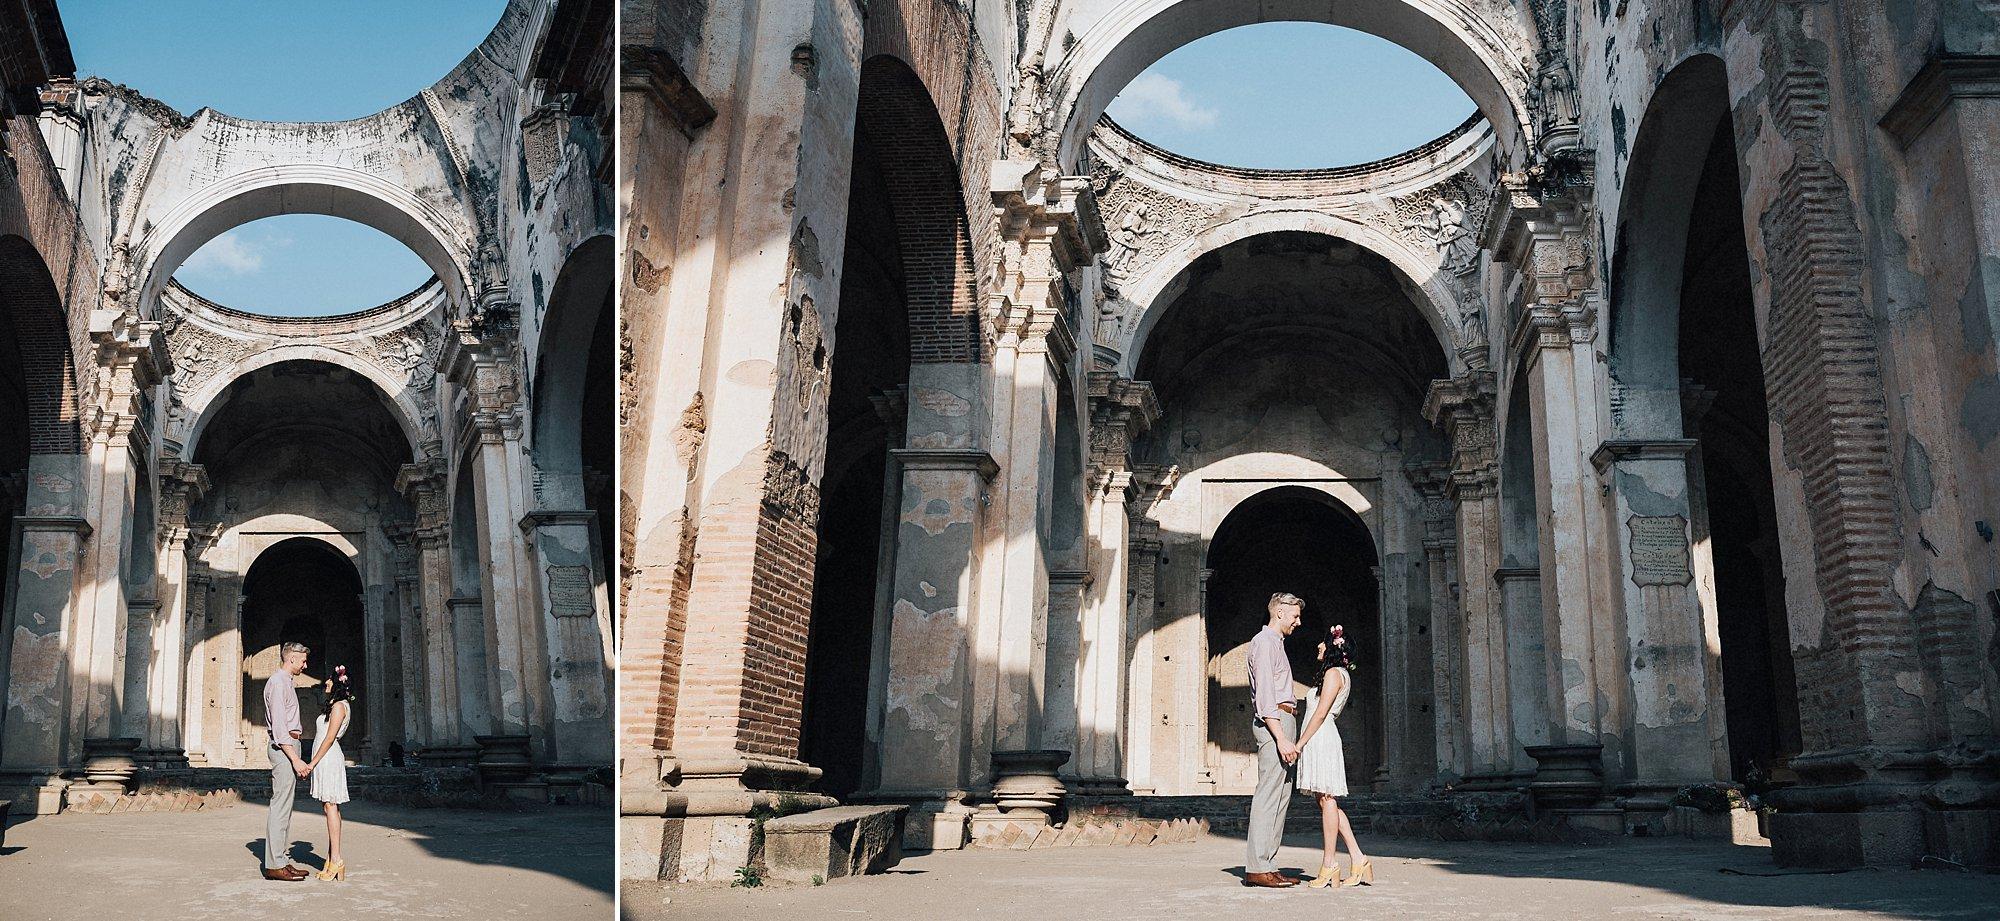 alex-yazmin-wedding-photographer-antigua-guatemala-014